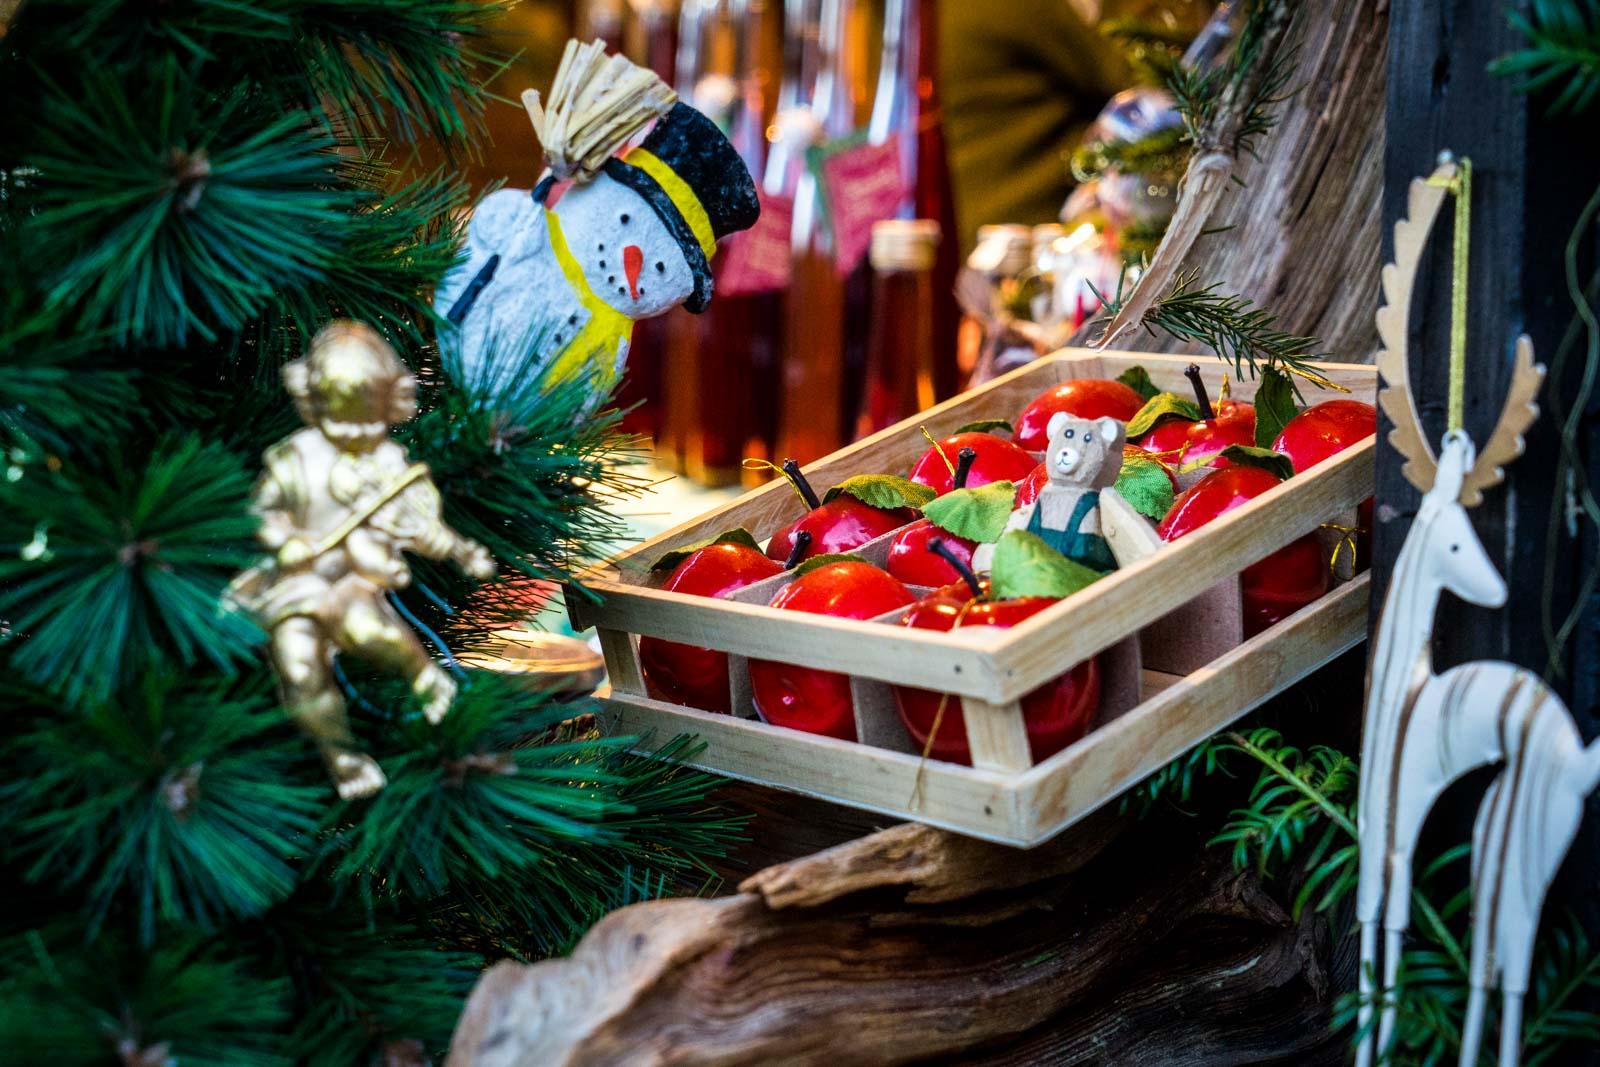 Tegernsee Christmas Markets, Bavaria, Germany